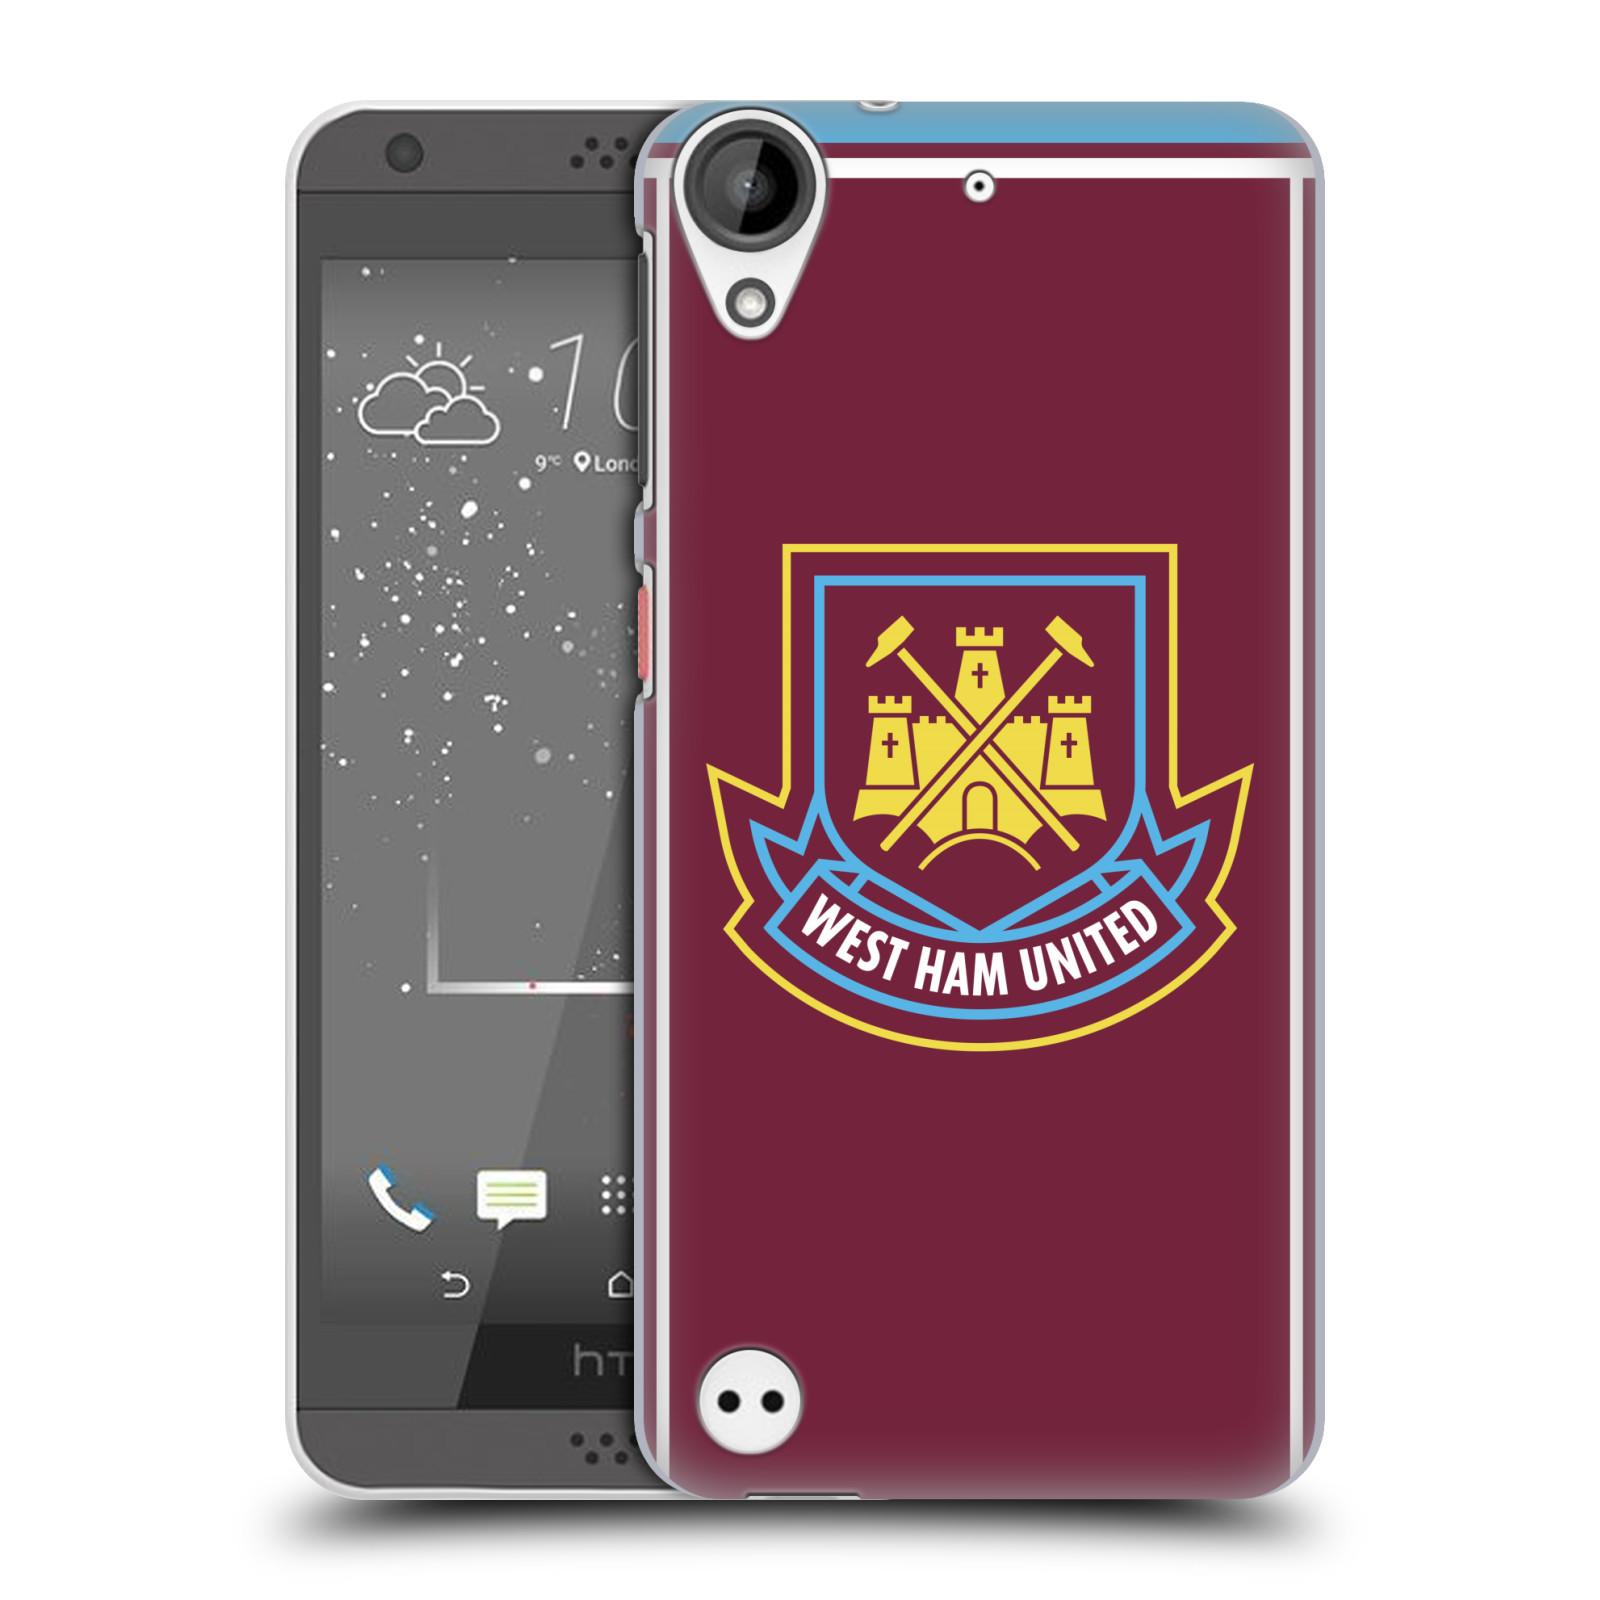 Plastové pouzdro na mobil HTC Desire 530 - Head Case - West Ham United - Retro znak